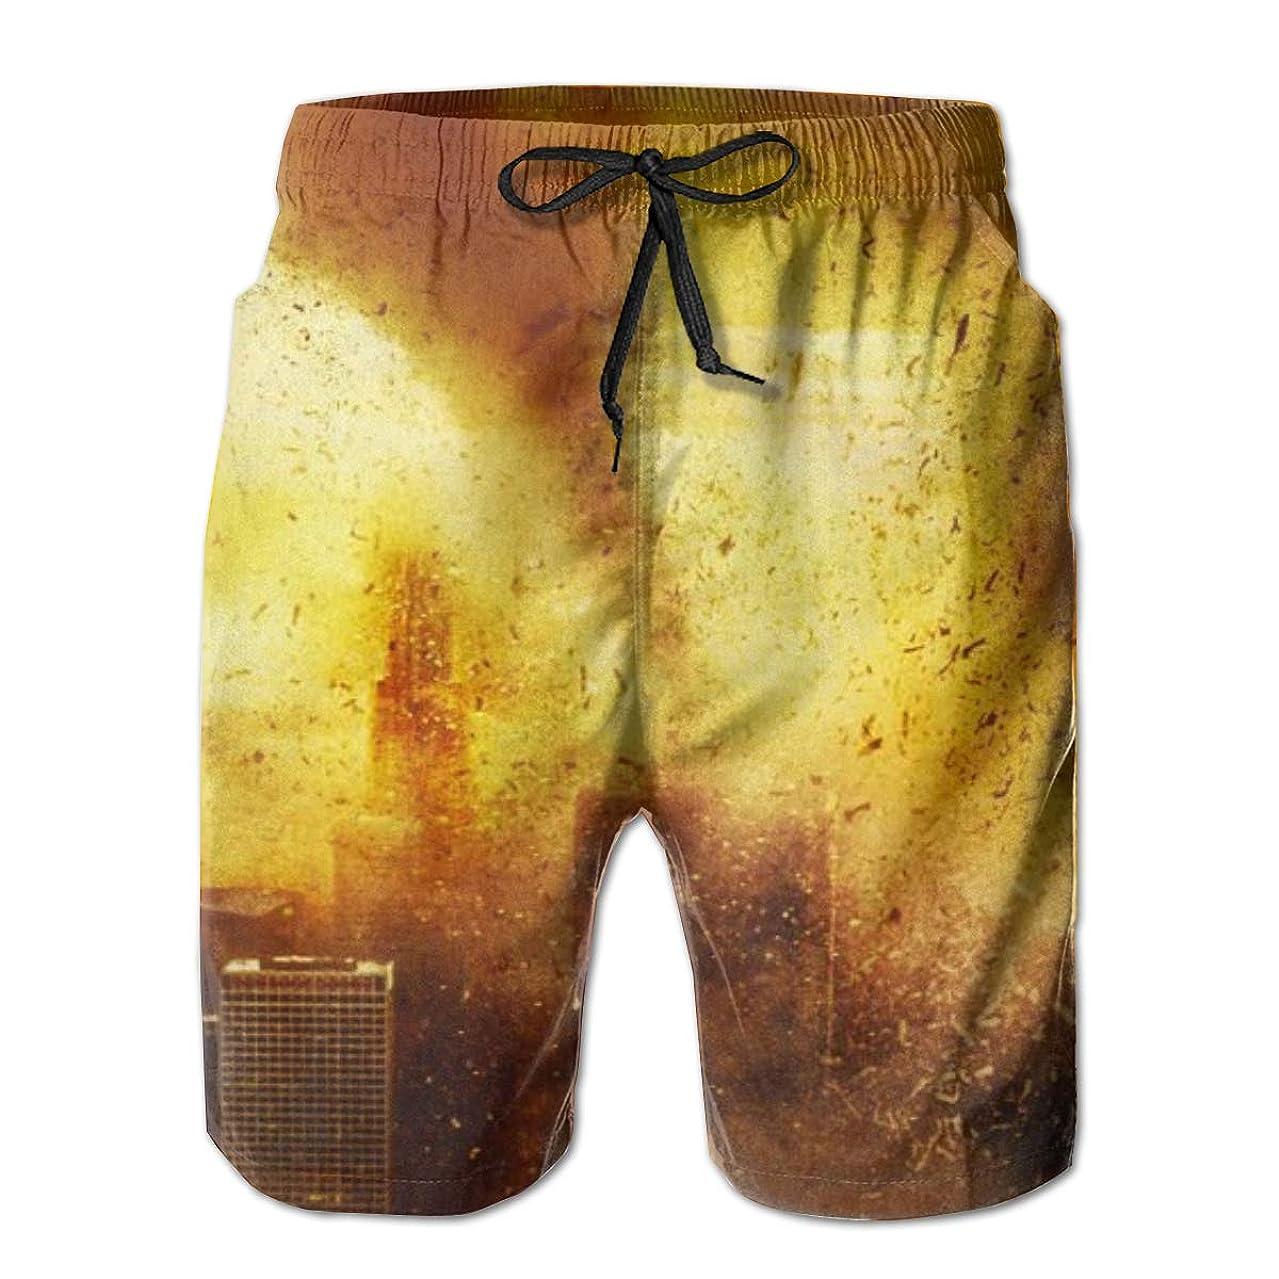 Quick Dry Men's Beach Shorts Tornado Destroy City Mesh Lining Surfing Swim Board Trunks with Pockets